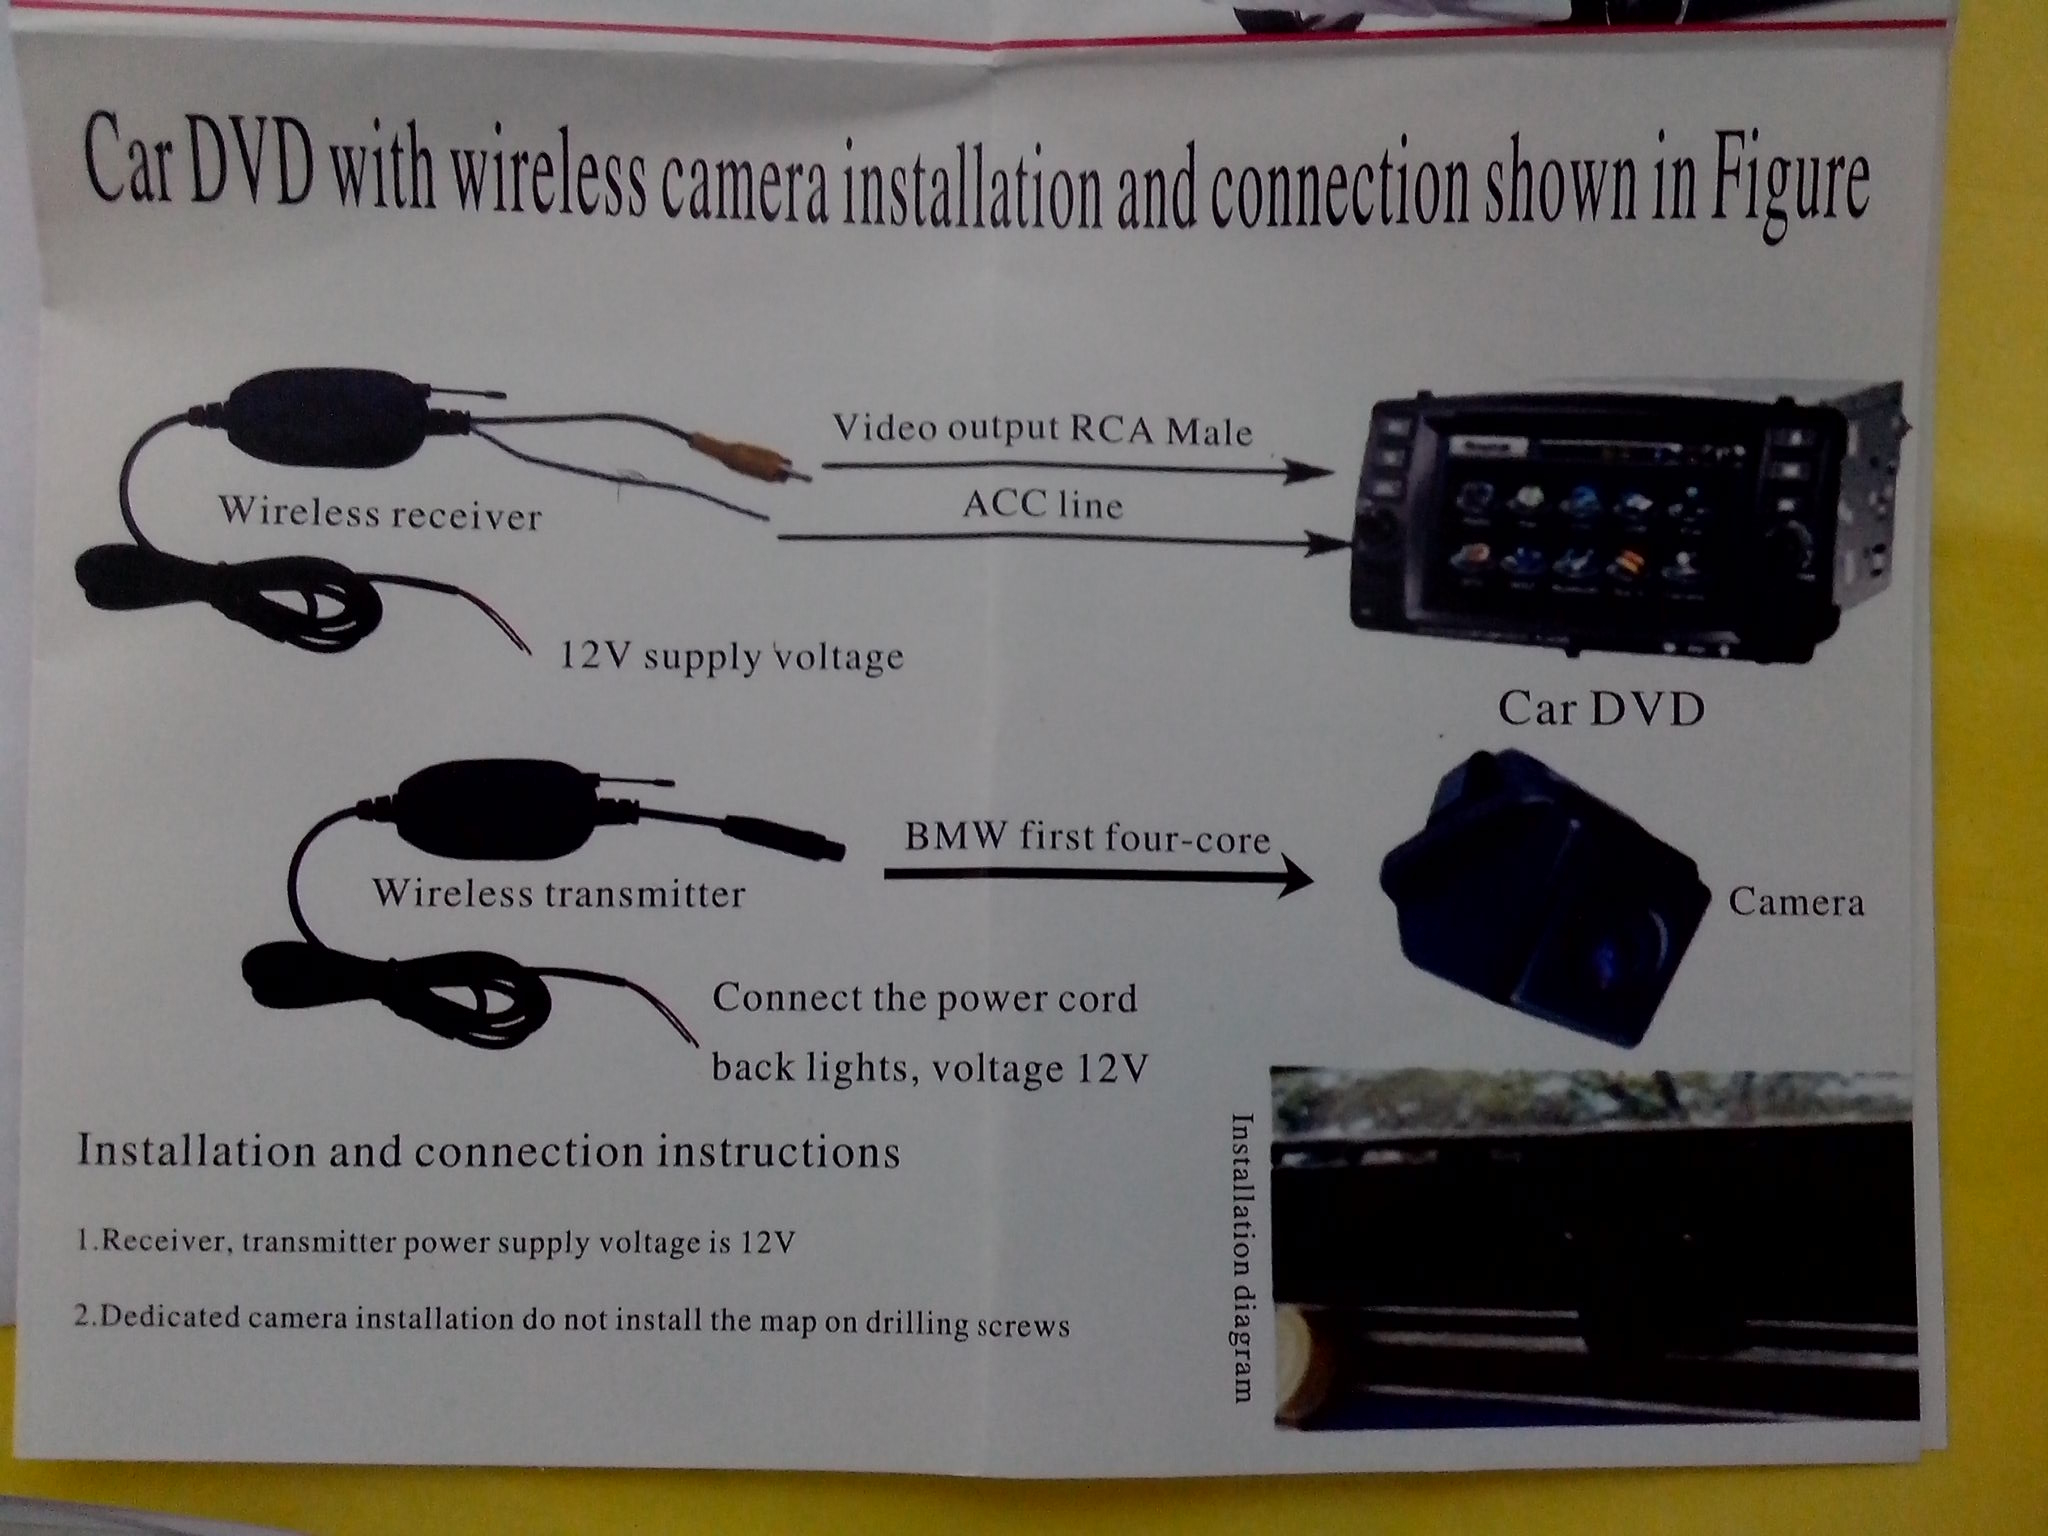 Voyager Camera Wiring Diagram | Manual E-Books - Voyager Backup Camera Wiring Diagram